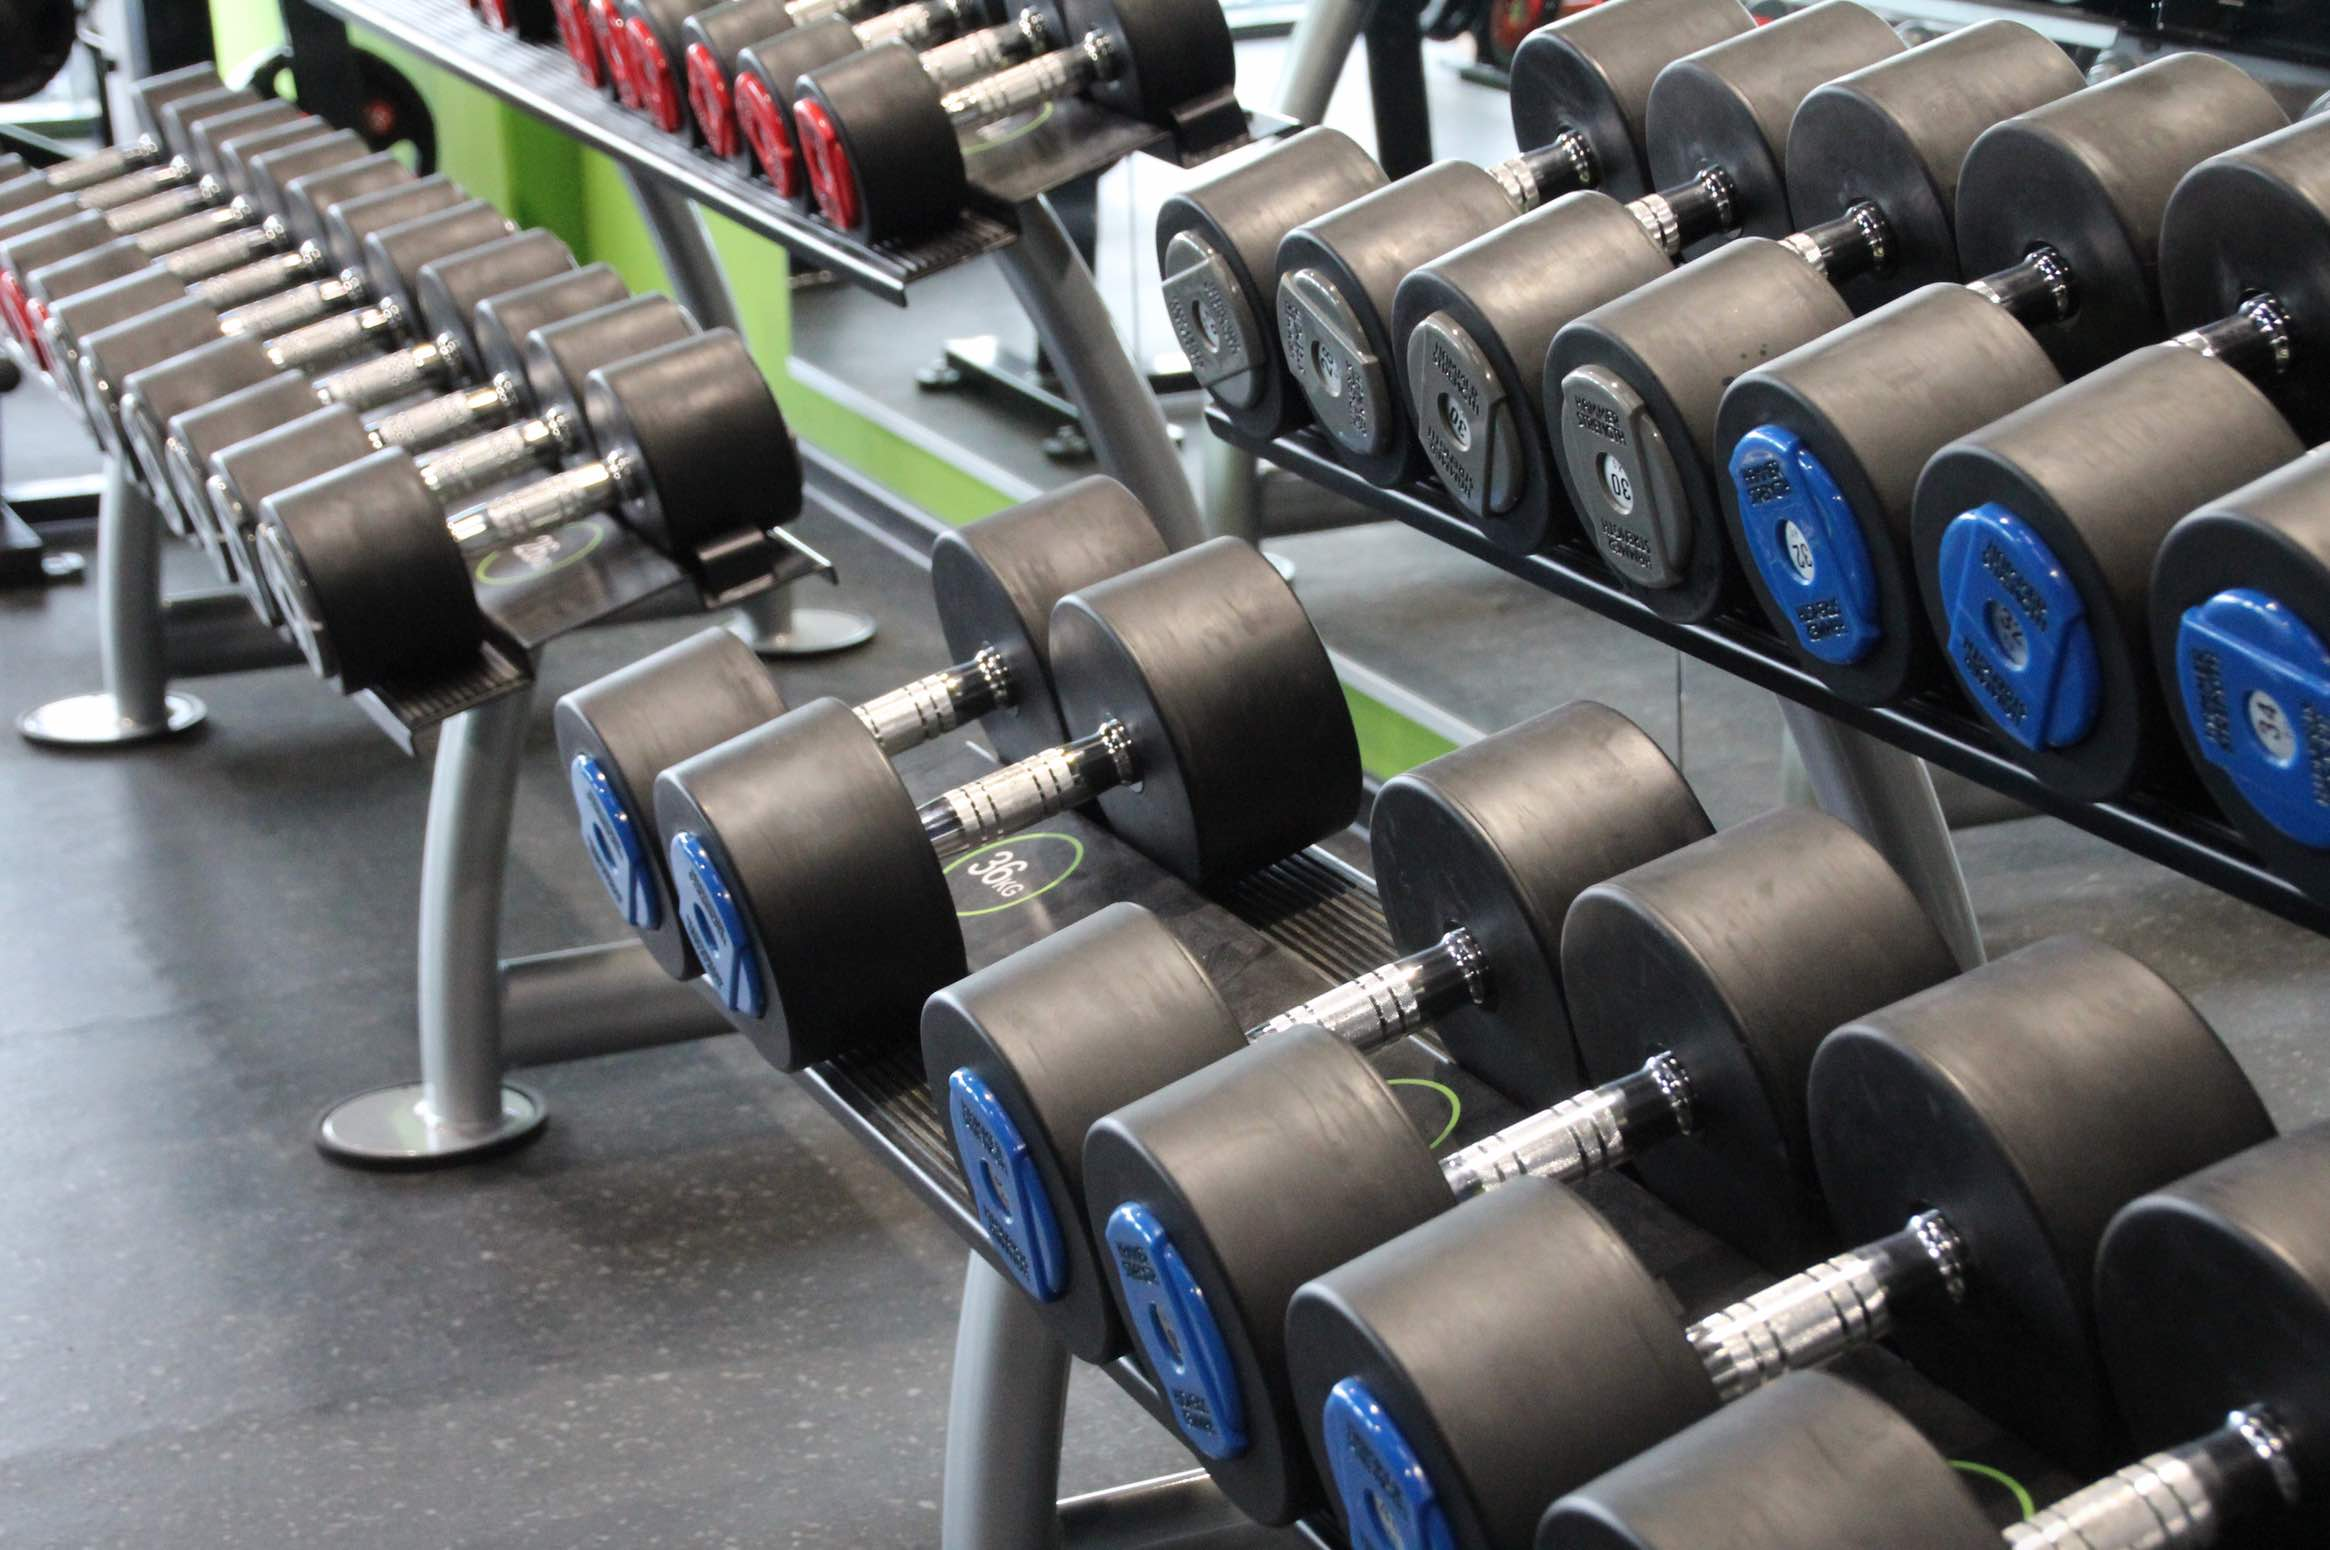 Corona Fitnessstudio Tipps